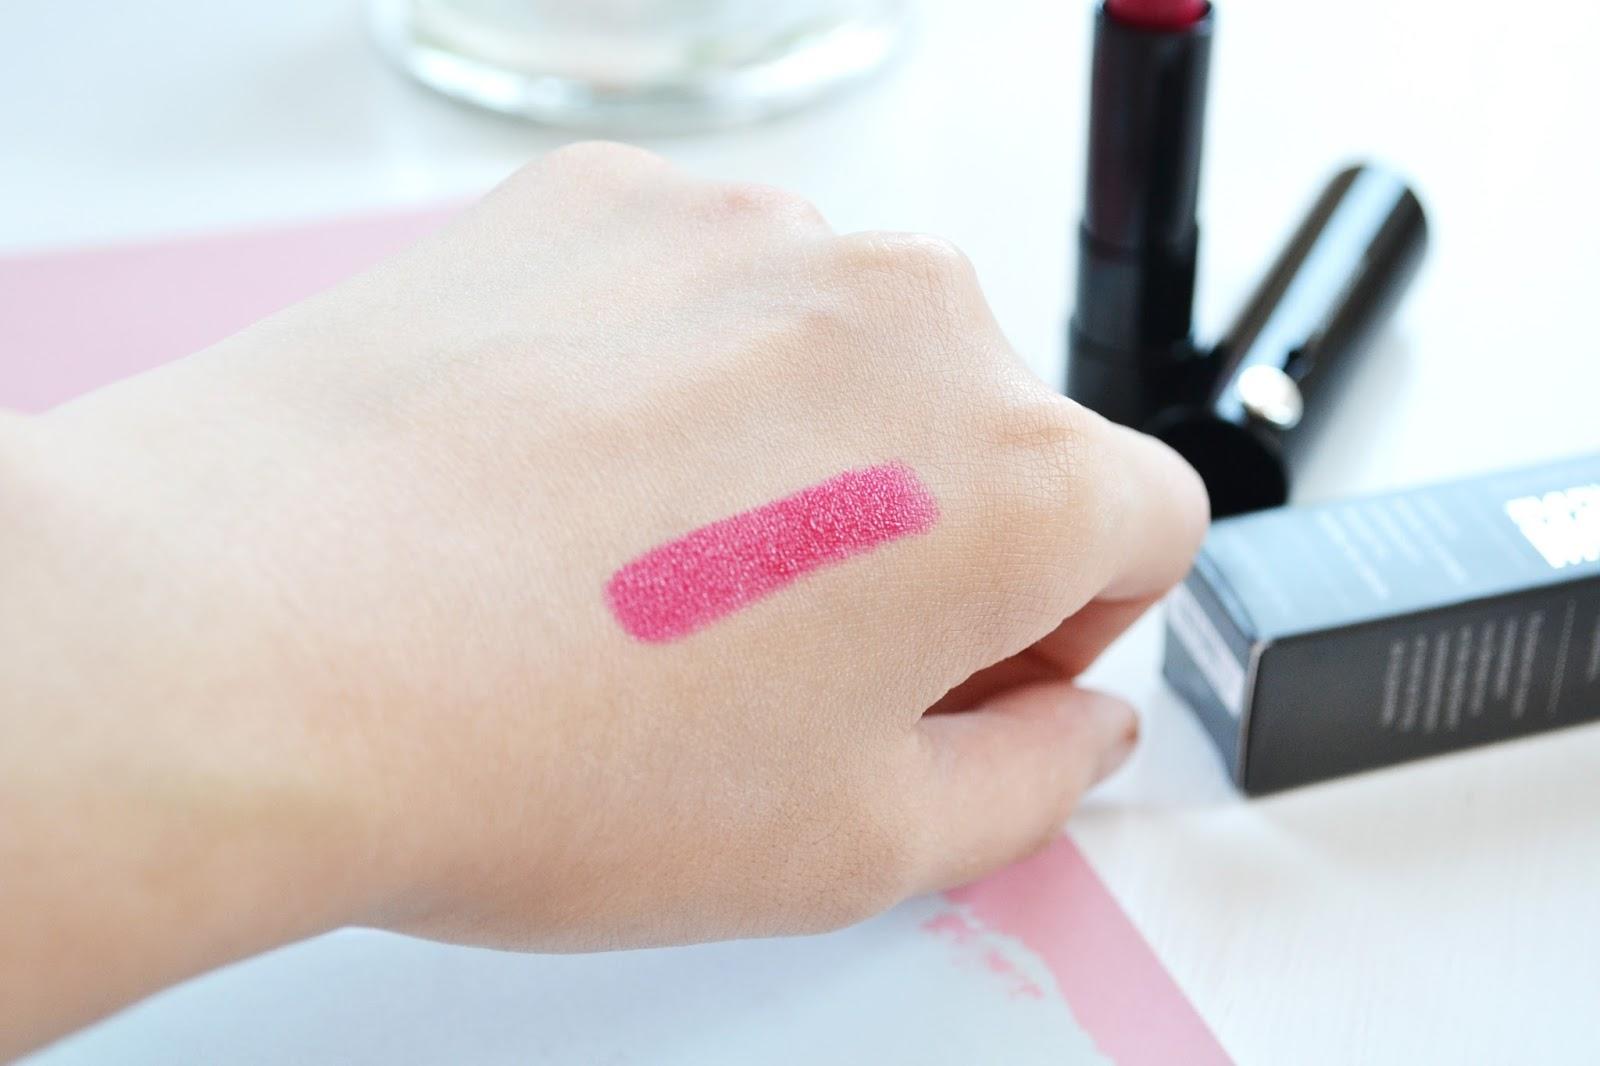 bareminerals risk it all lipstick swatch